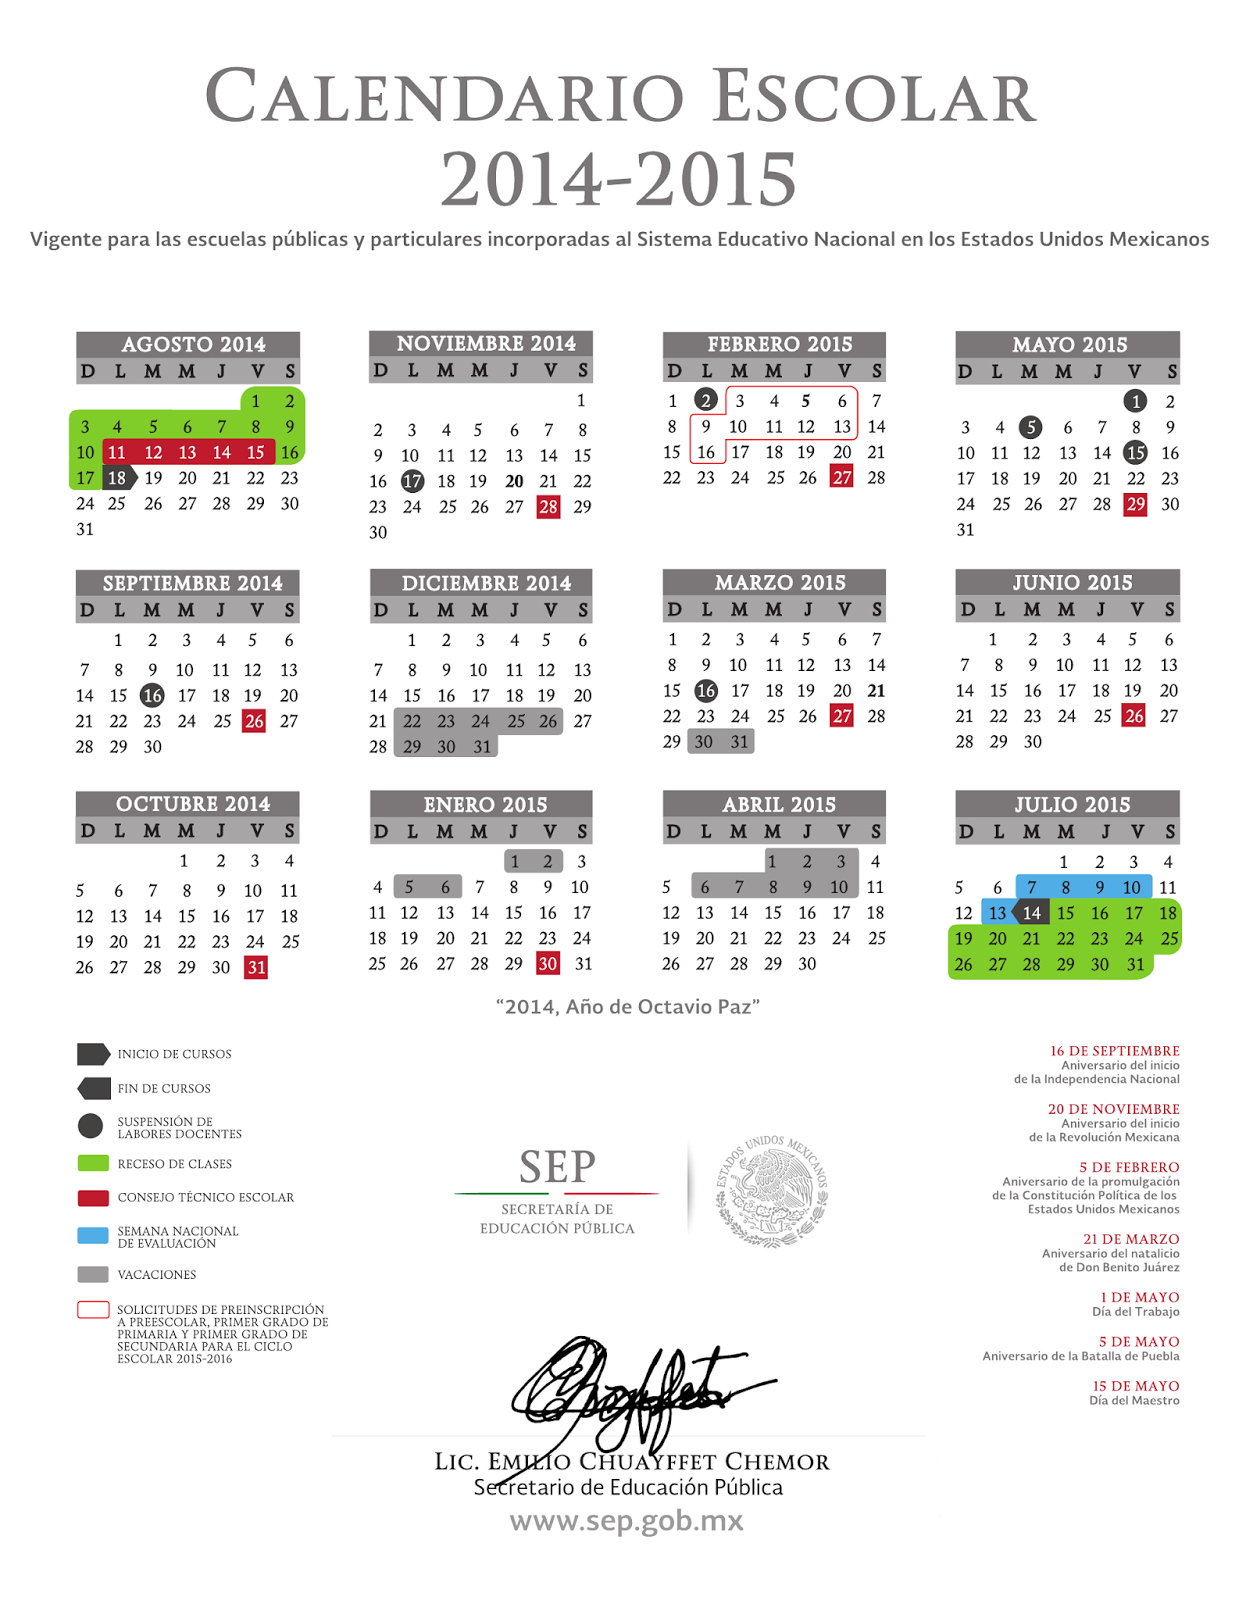 ... ://www.sep.gob.mx/es/sep1/Calendario_2014_2015 y http://goo.gl/9QDgVX